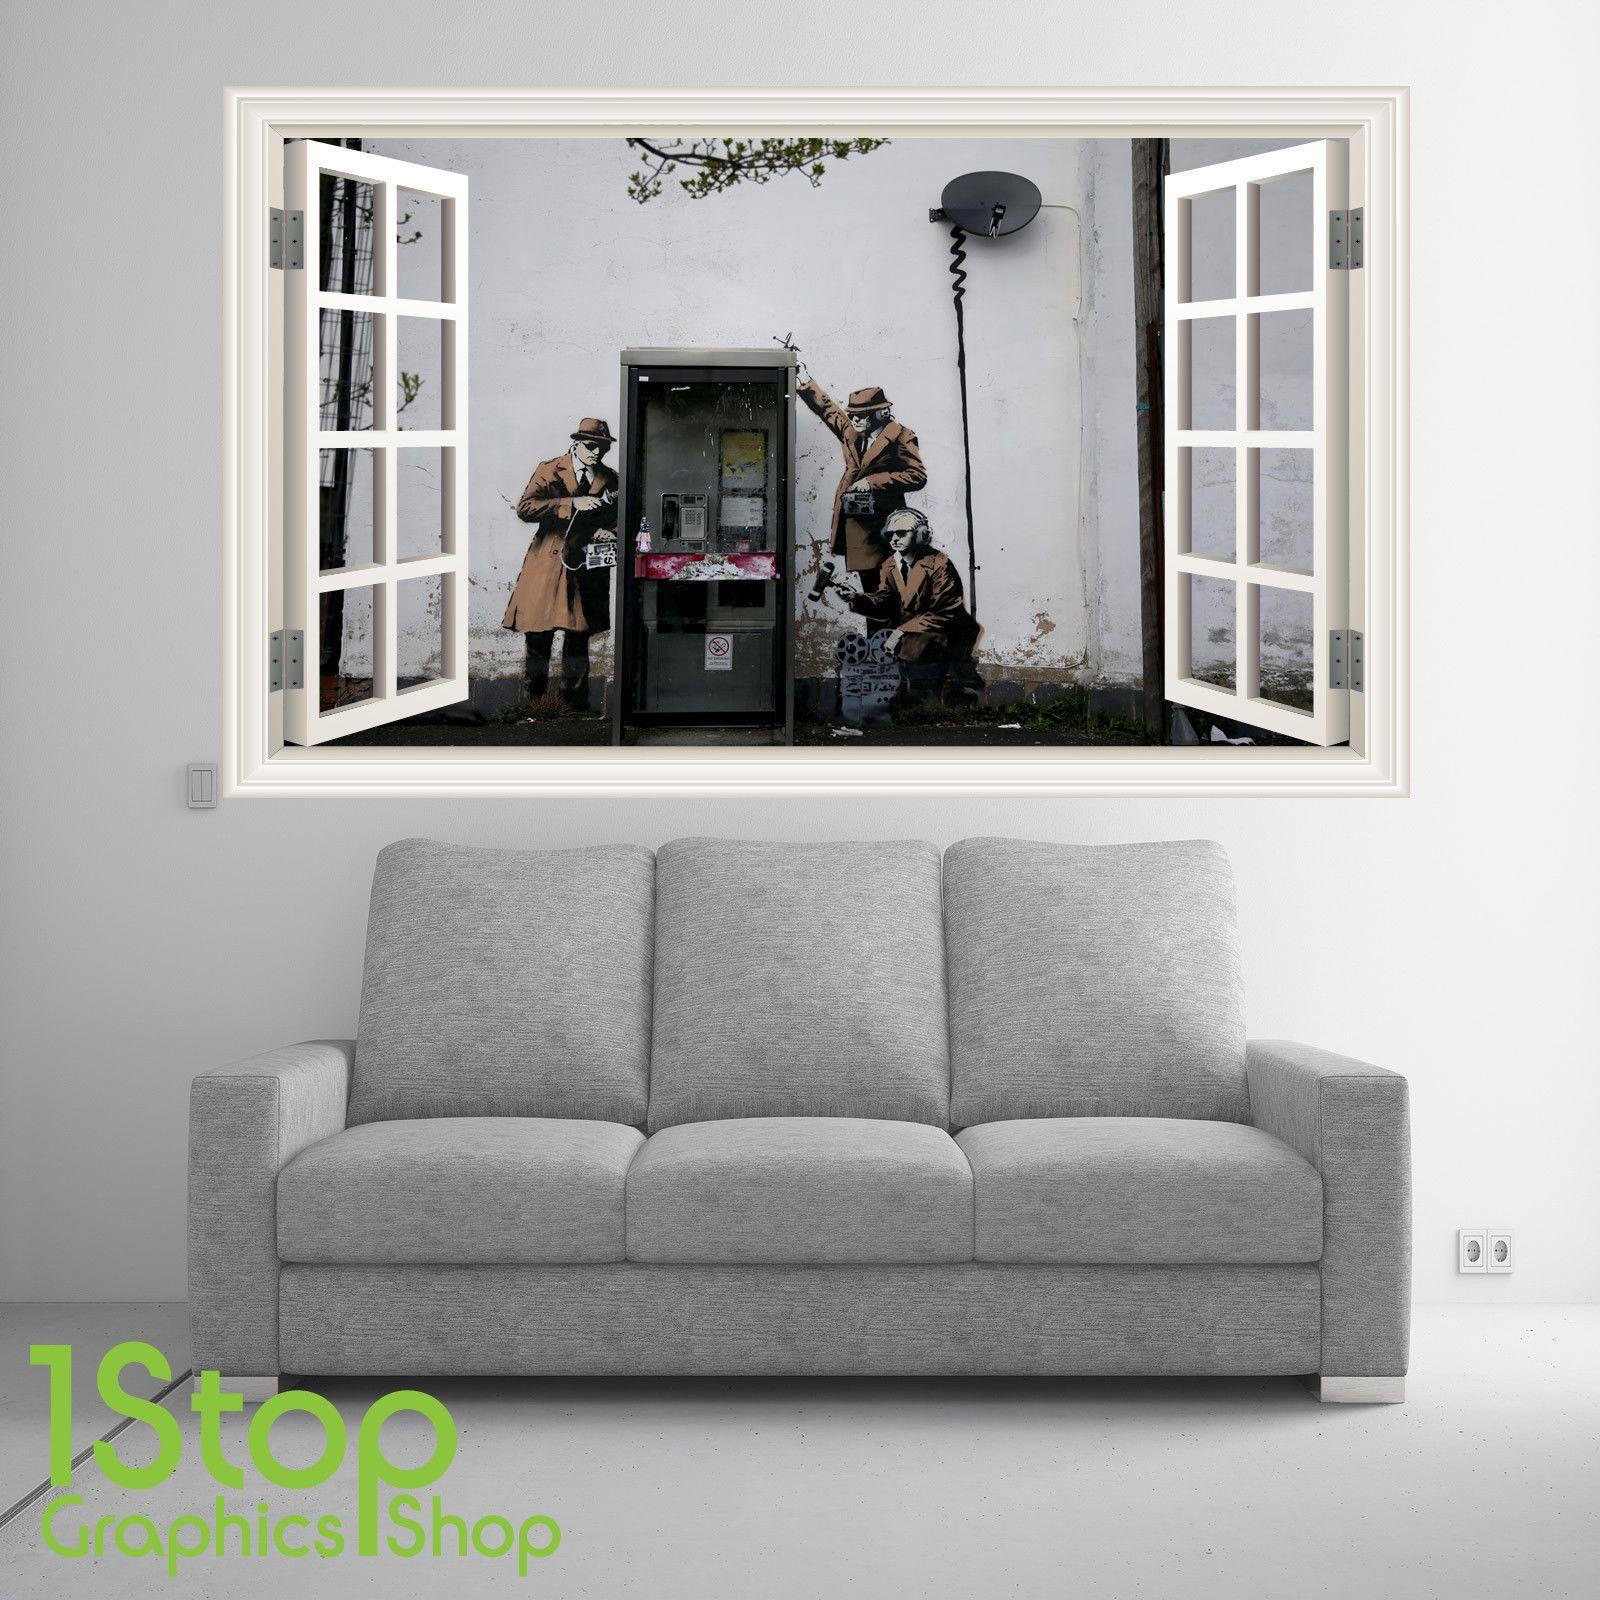 Banksy wall sticker window full colour lounge home bedroom wall art